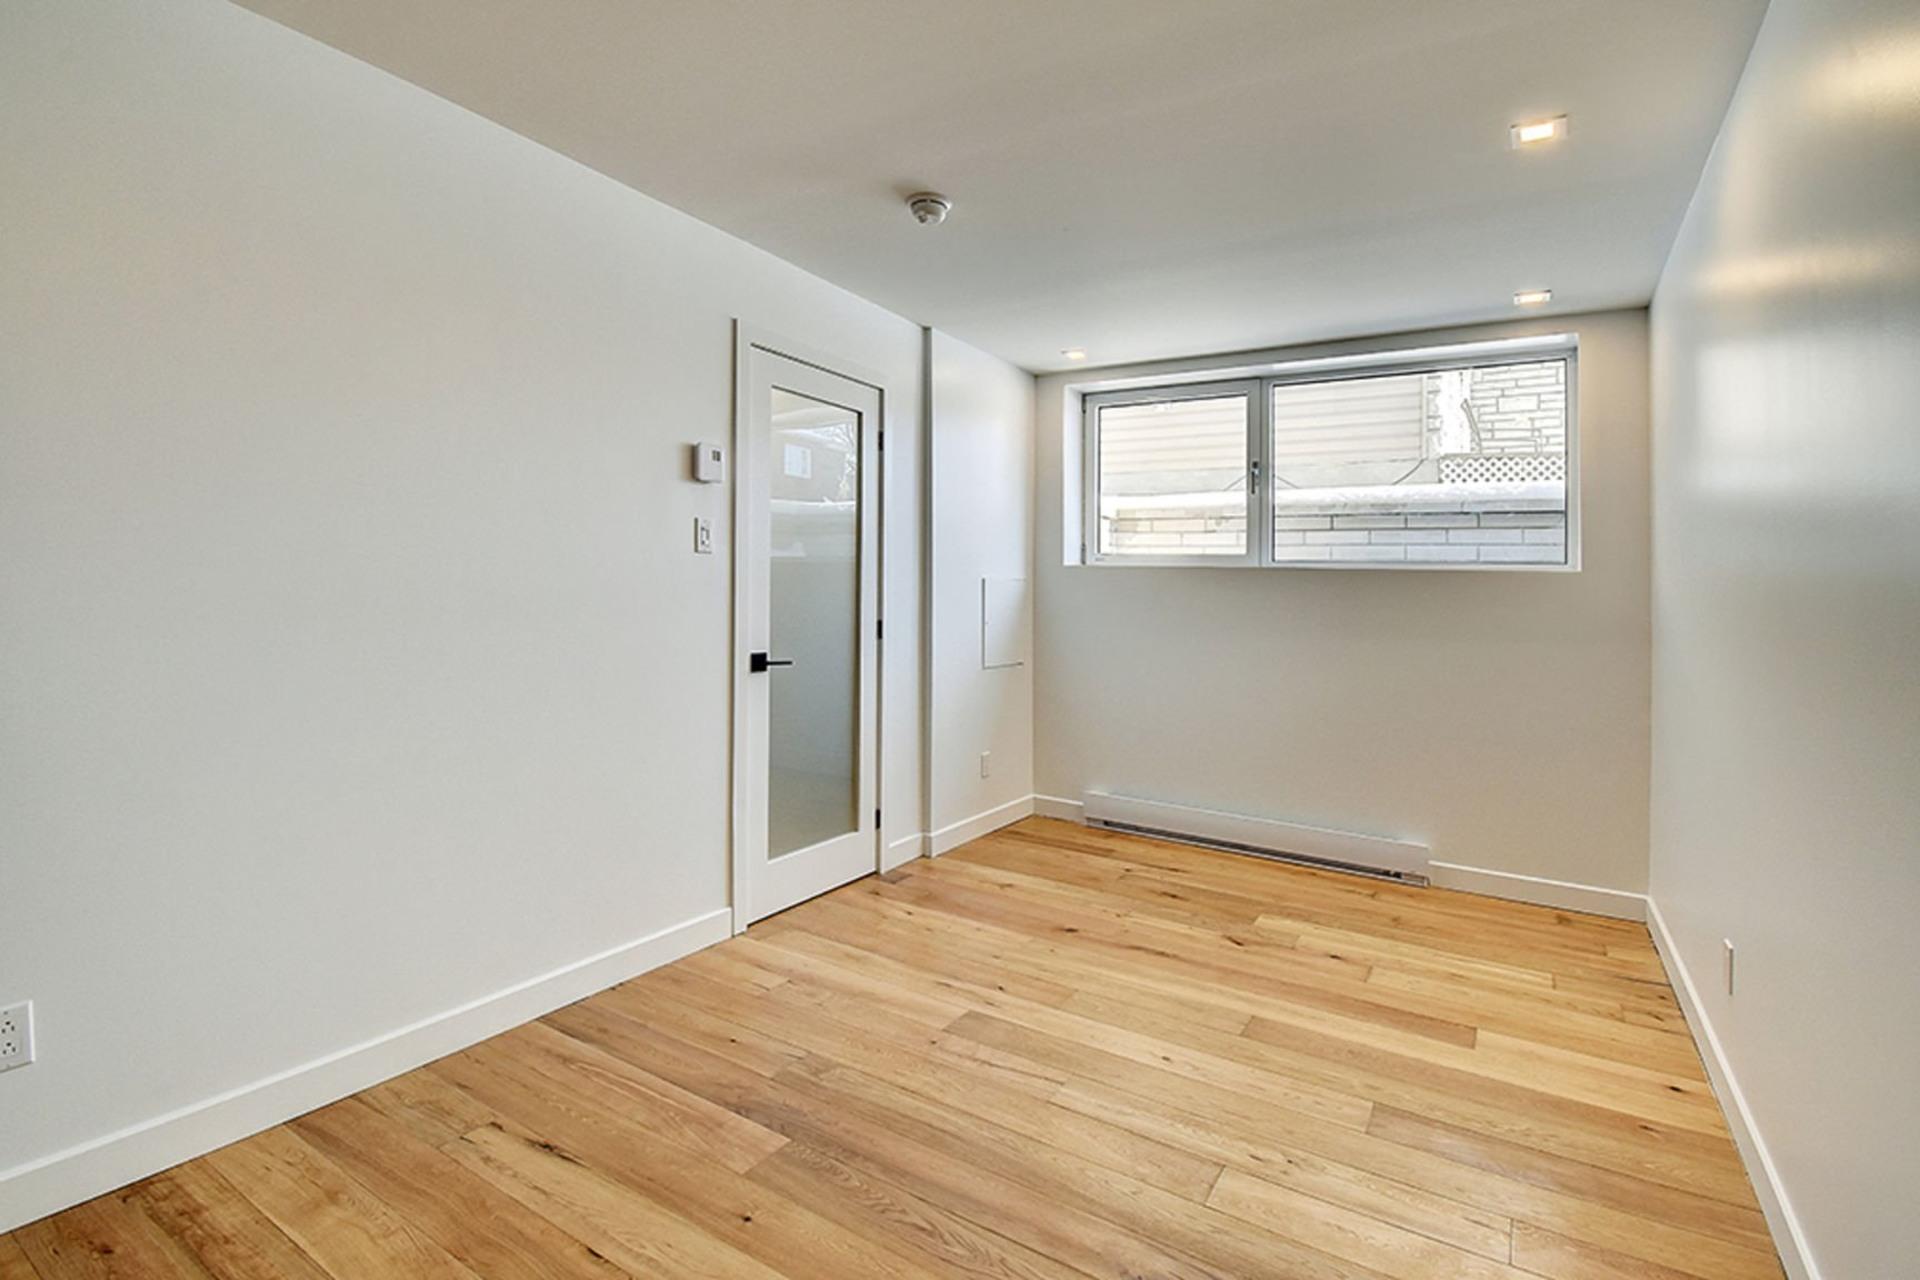 image 15 - Apartment For sale Le Vieux-Longueuil Longueuil  - 9 rooms